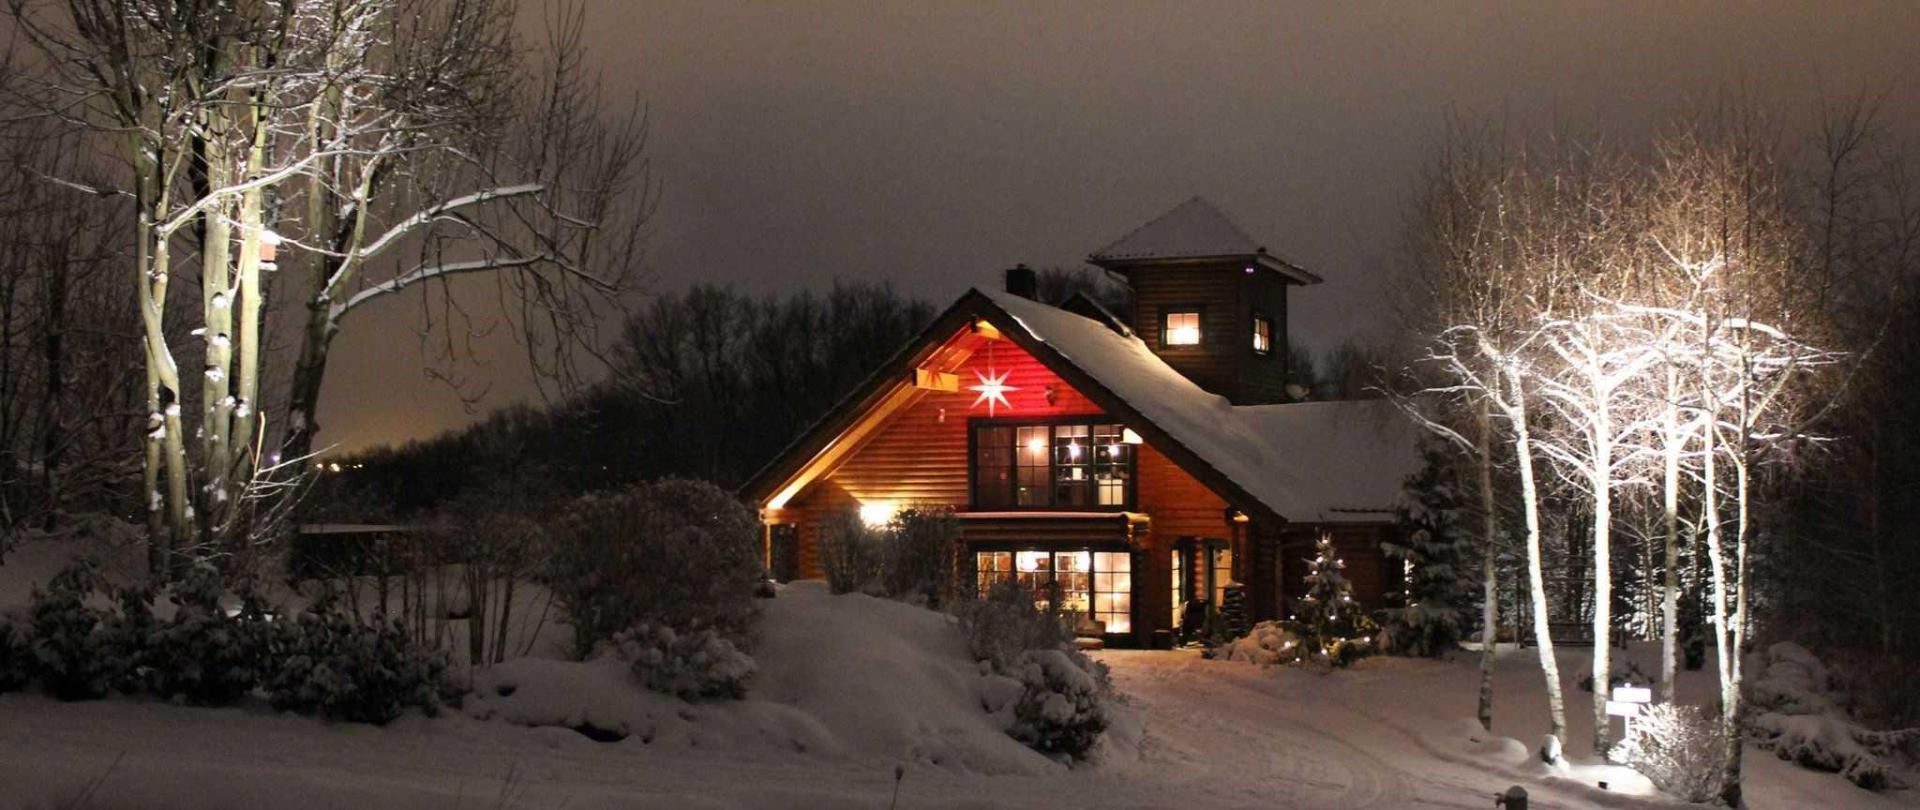 front_winter.jpg